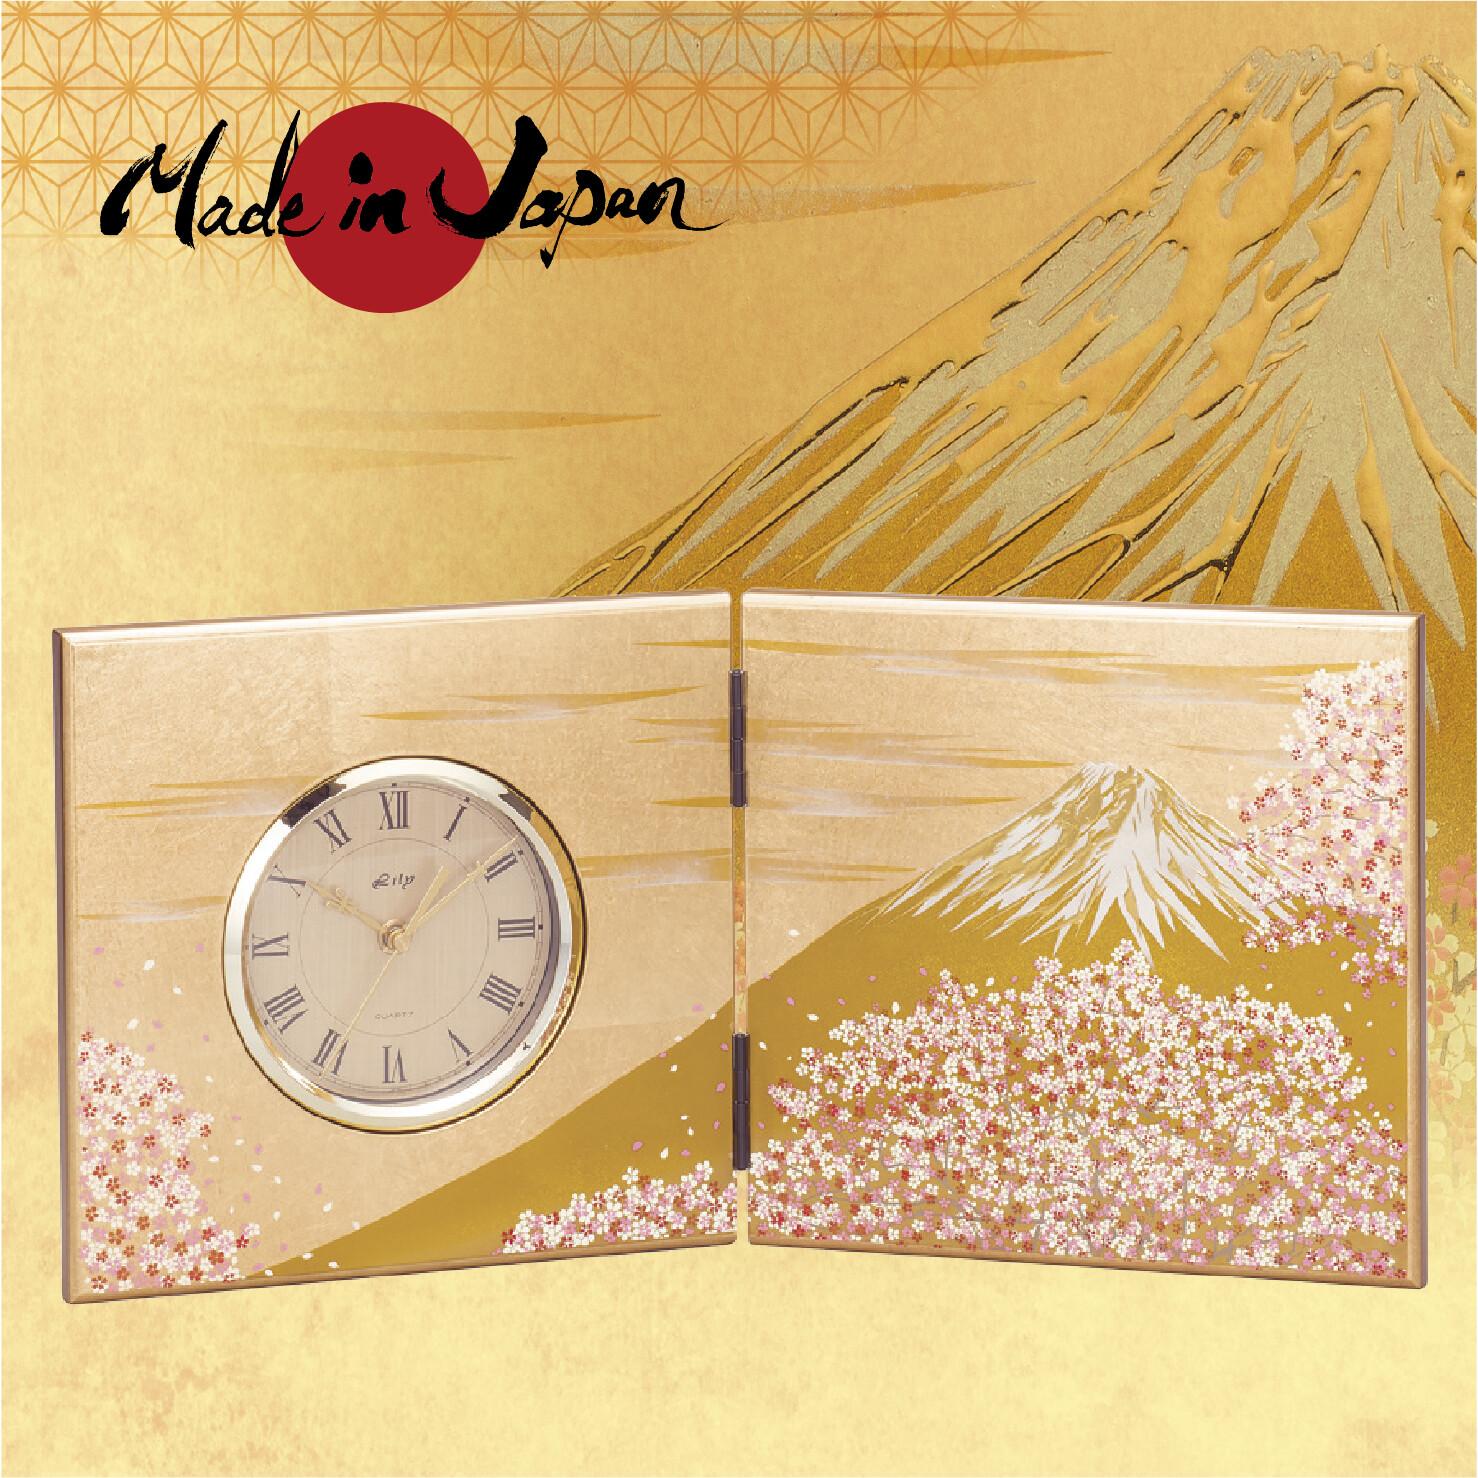 Fuji Miyabizakura Folding Screen Clock L Import Japanese Products At Wholesale Prices Super Delivery